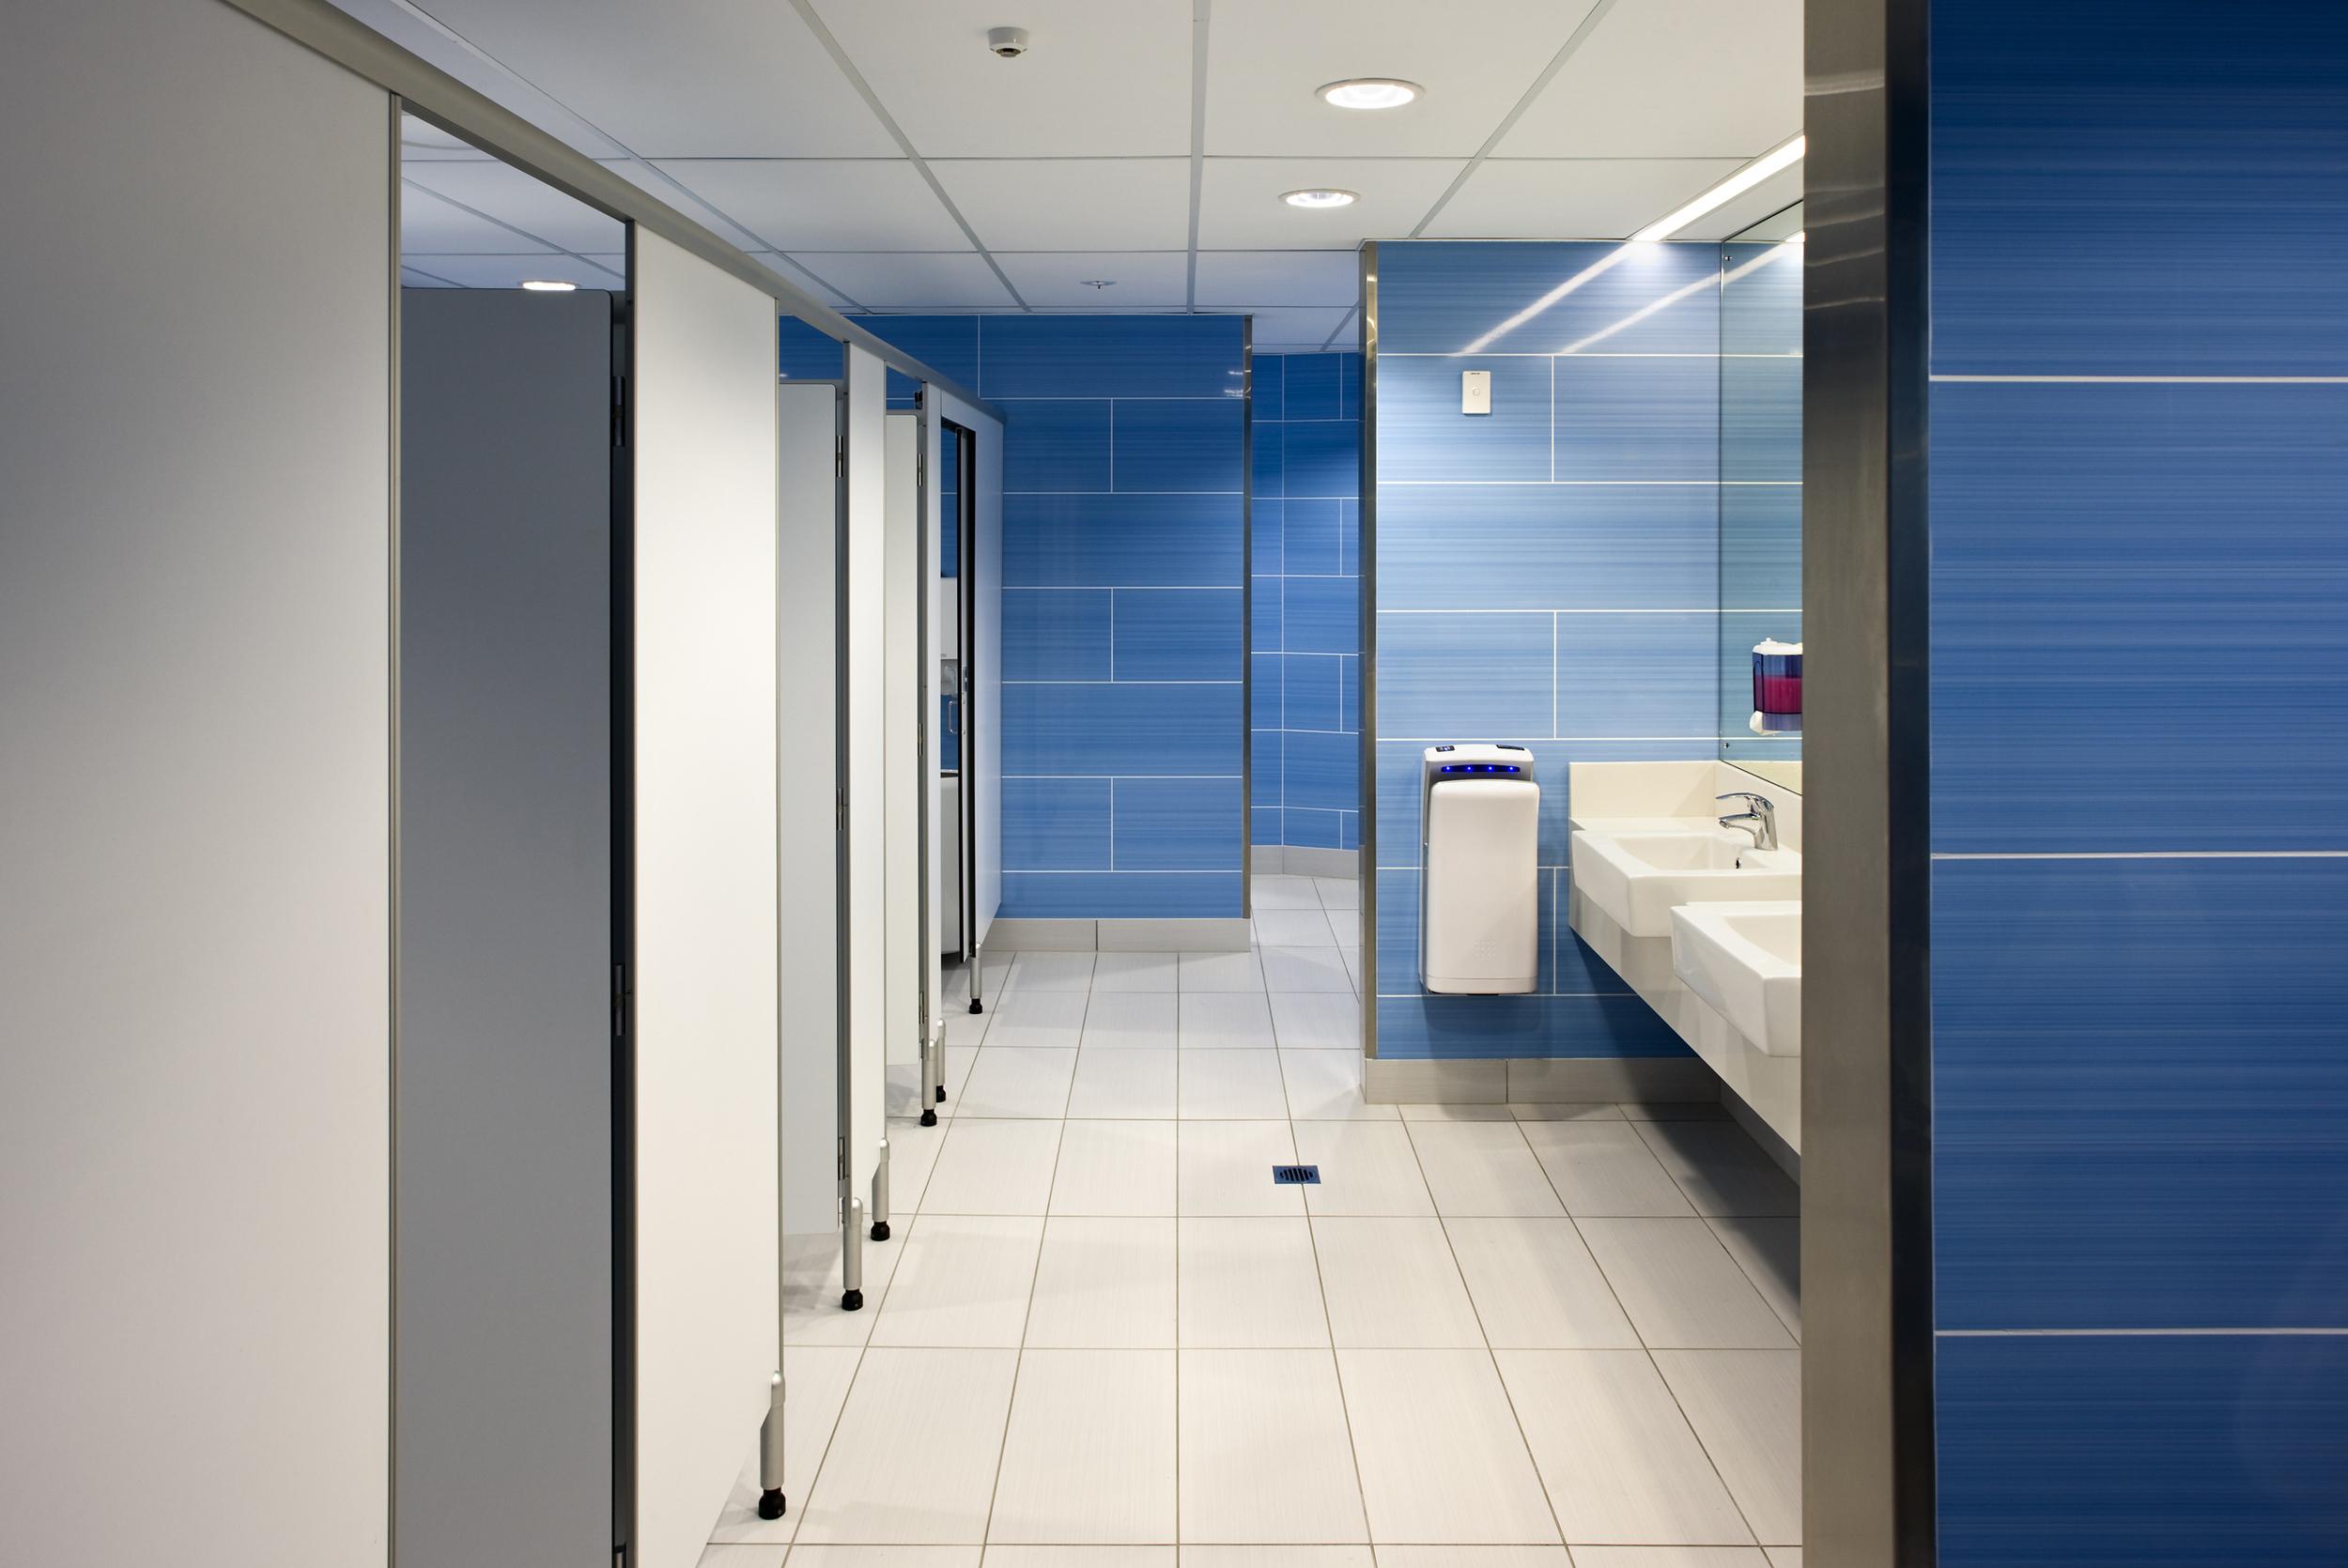 Mercury_Bathrooms_L1023_M.jpg